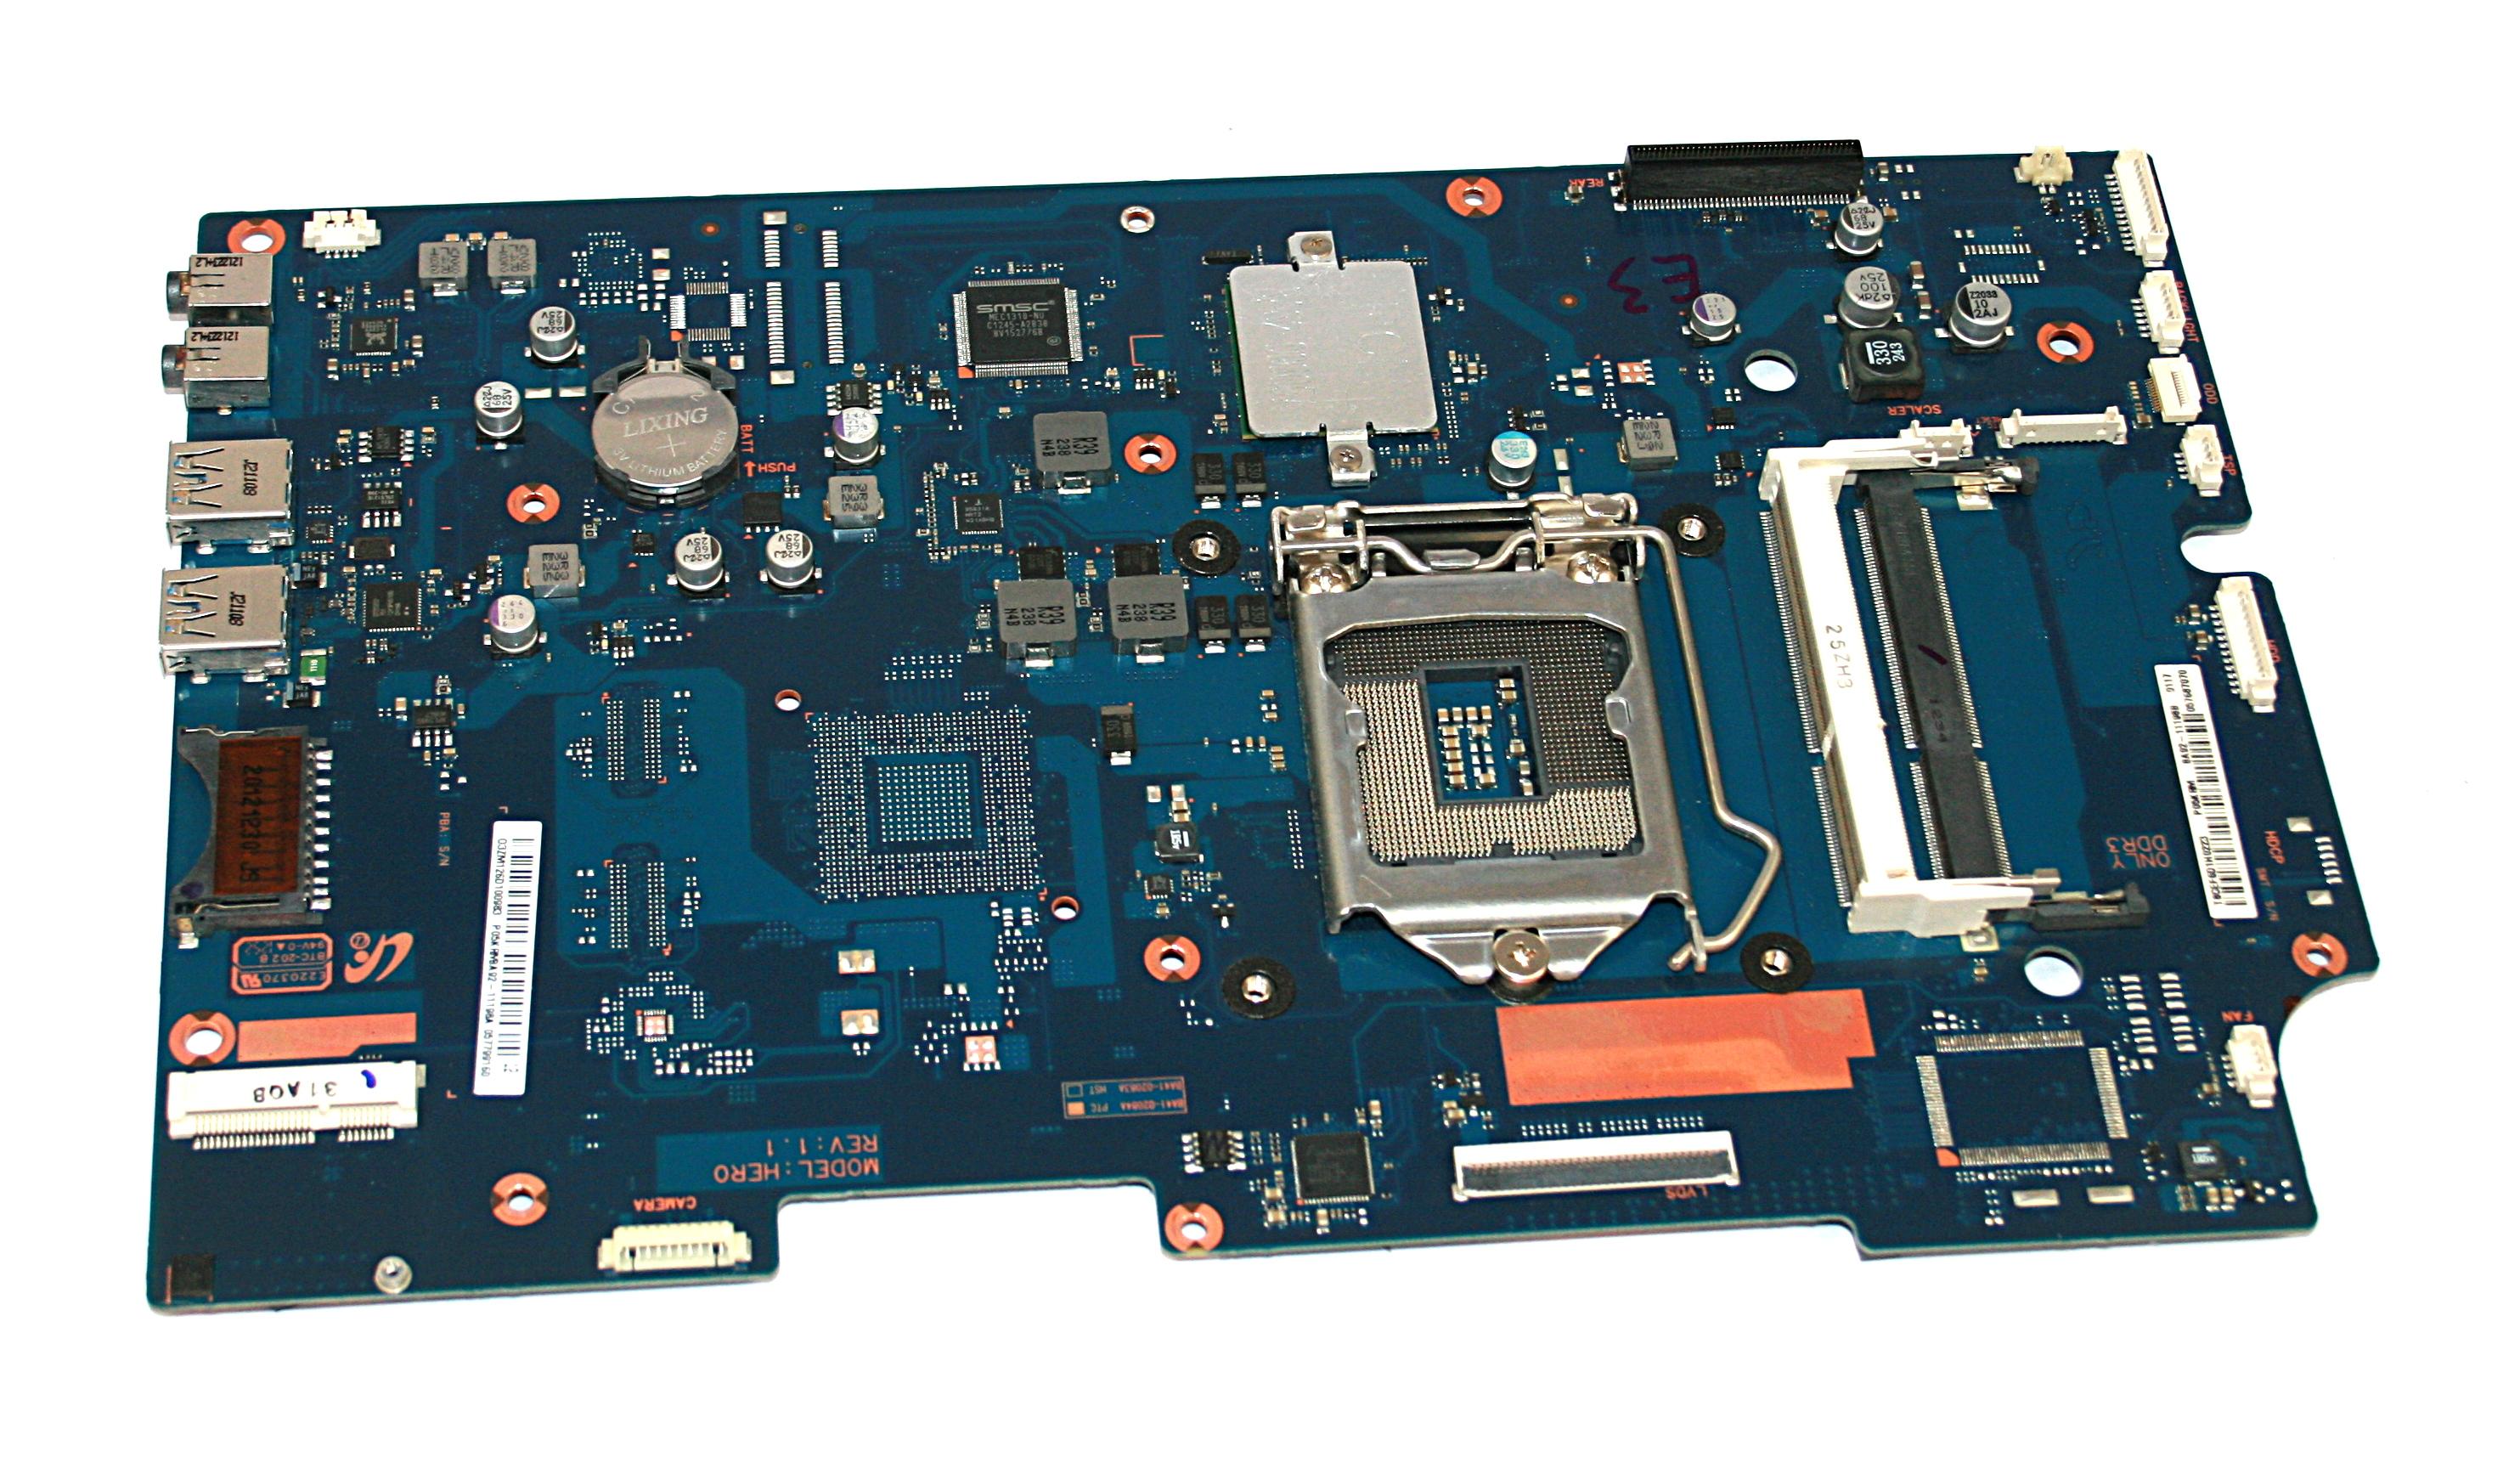 Samsung BA92-11198 Socket H2 LGA1155 Motherboard f/ AIO PC DP500A2D